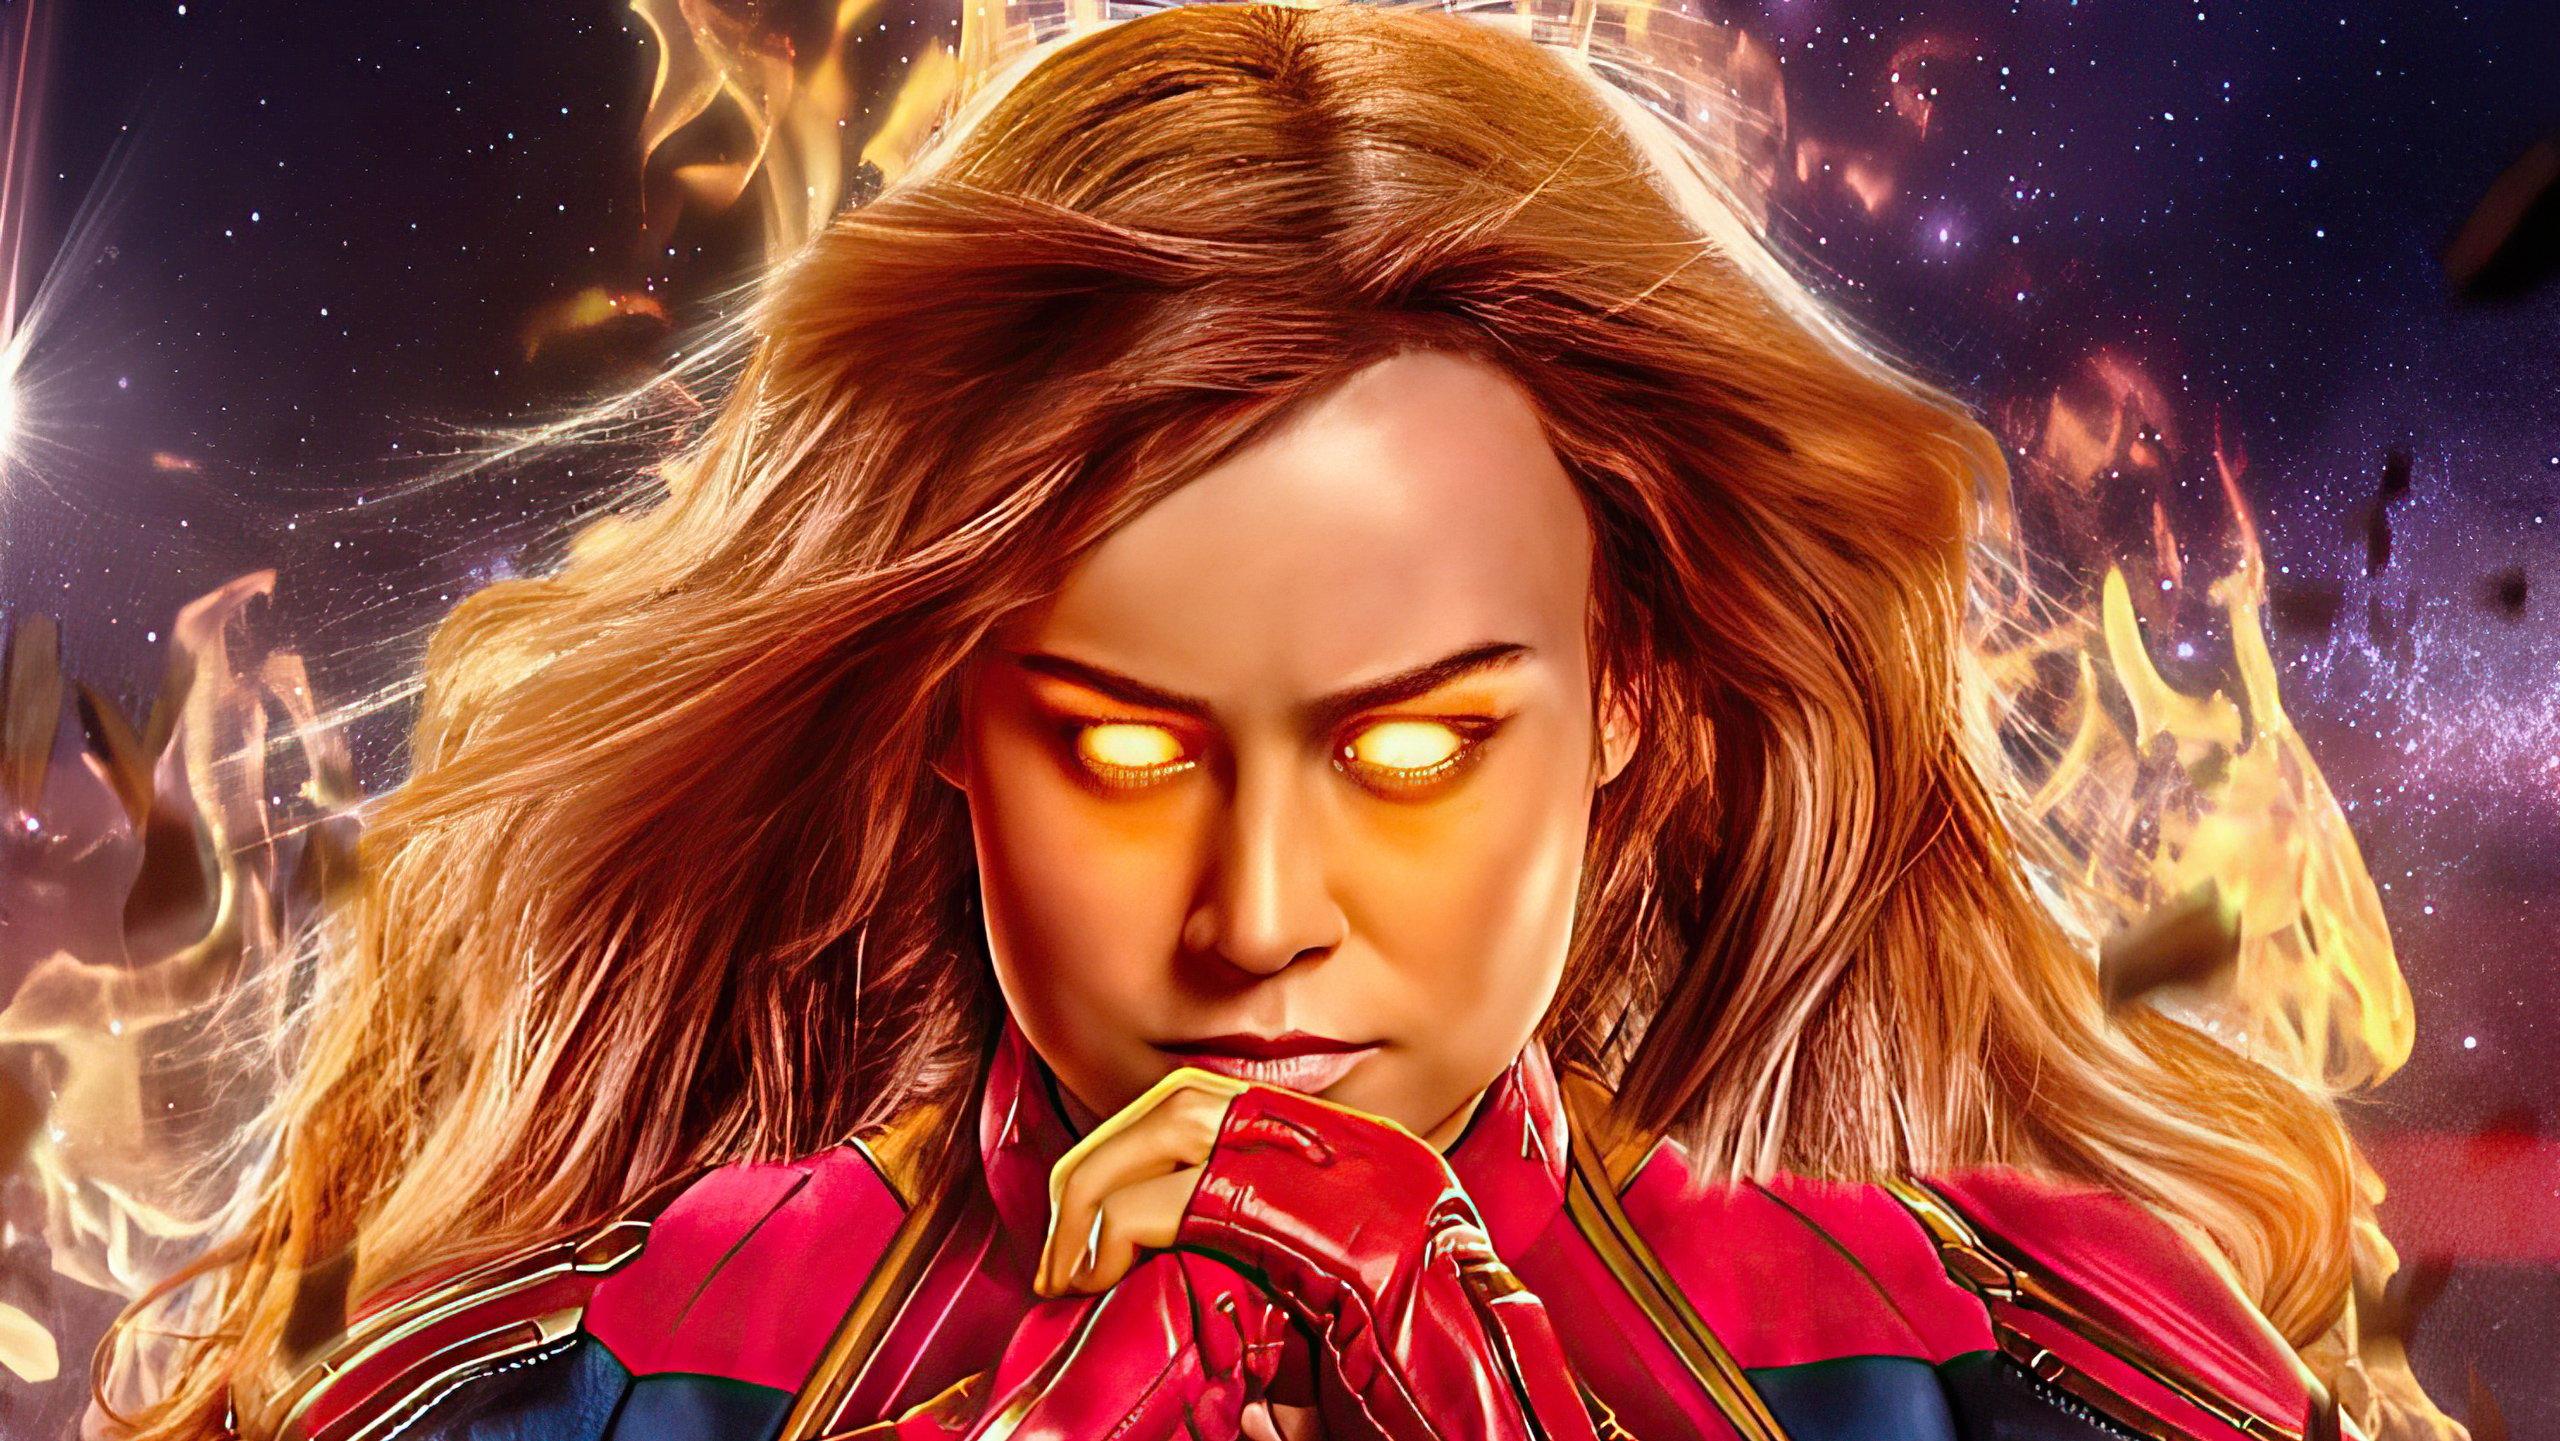 Fondos de pantalla Capitana Marvel 2020 Fanart